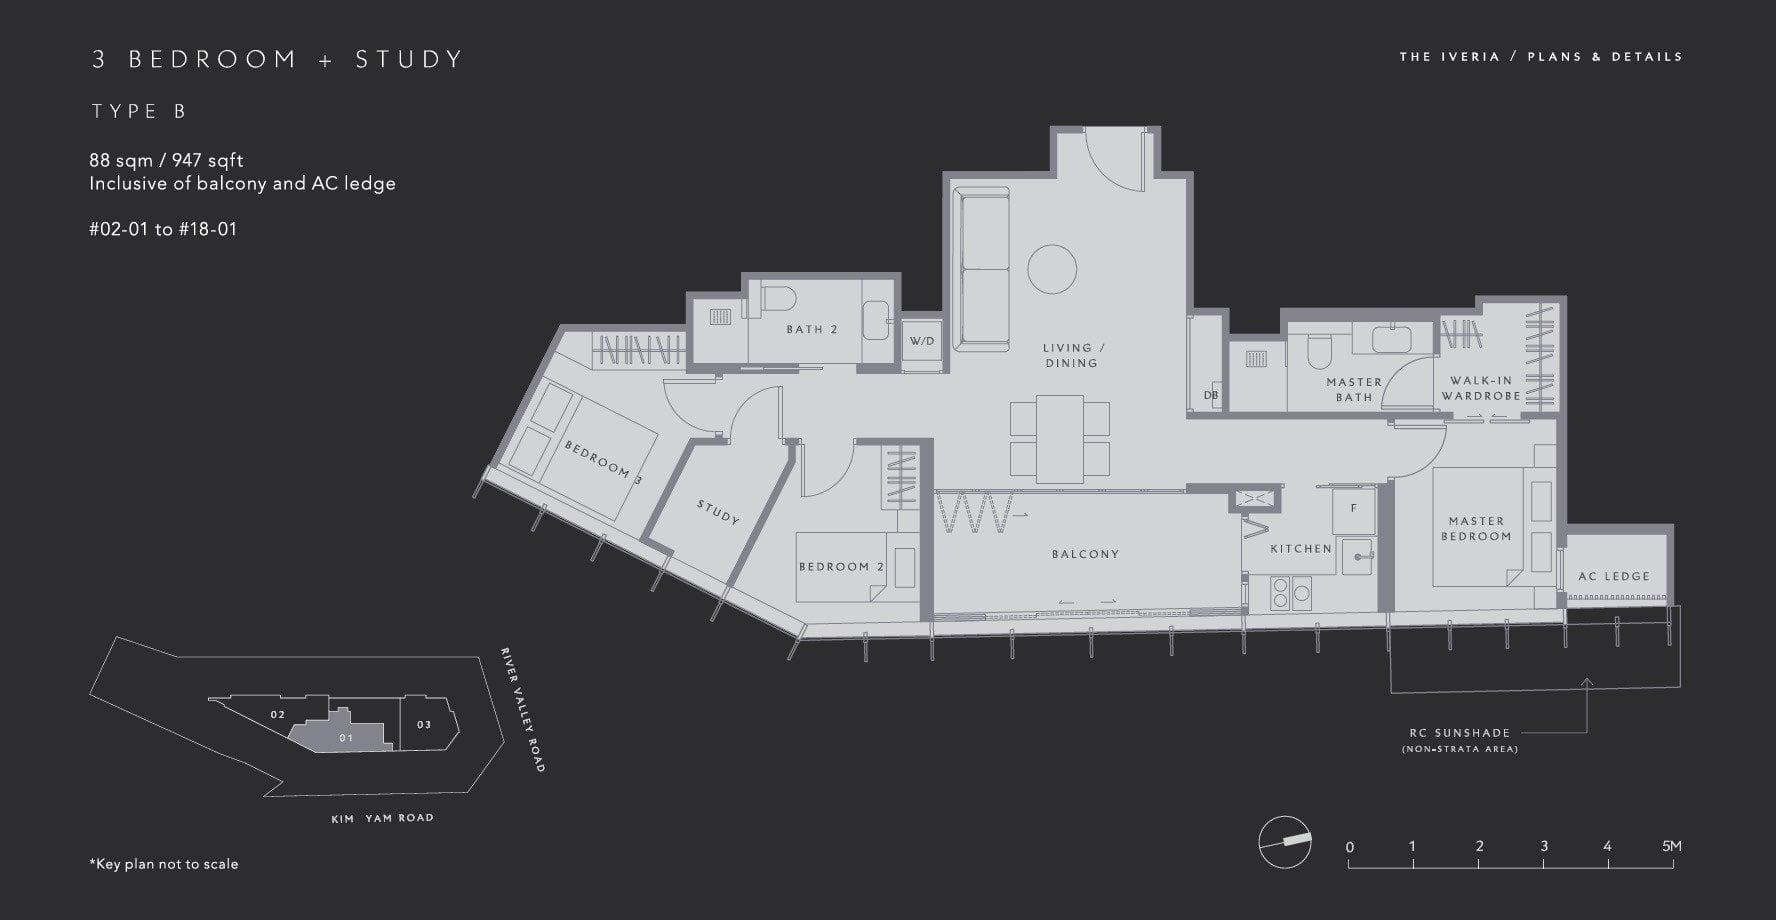 The-Iveria-Floor Plan Type B 3BR +S